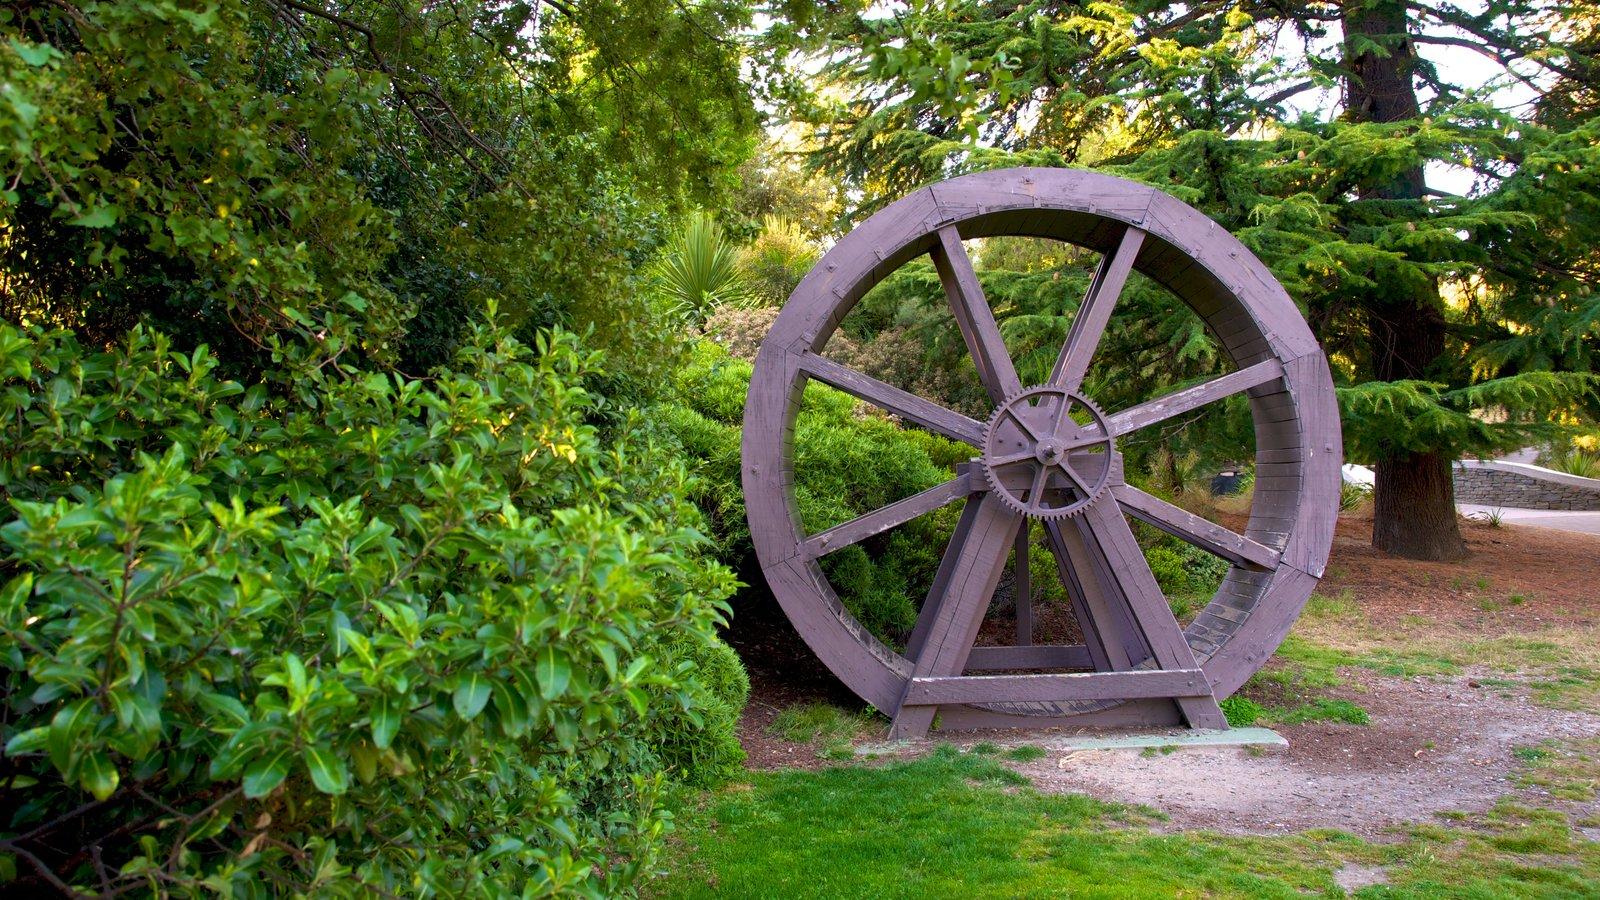 Queenstown Gardens showing outdoor art and a park